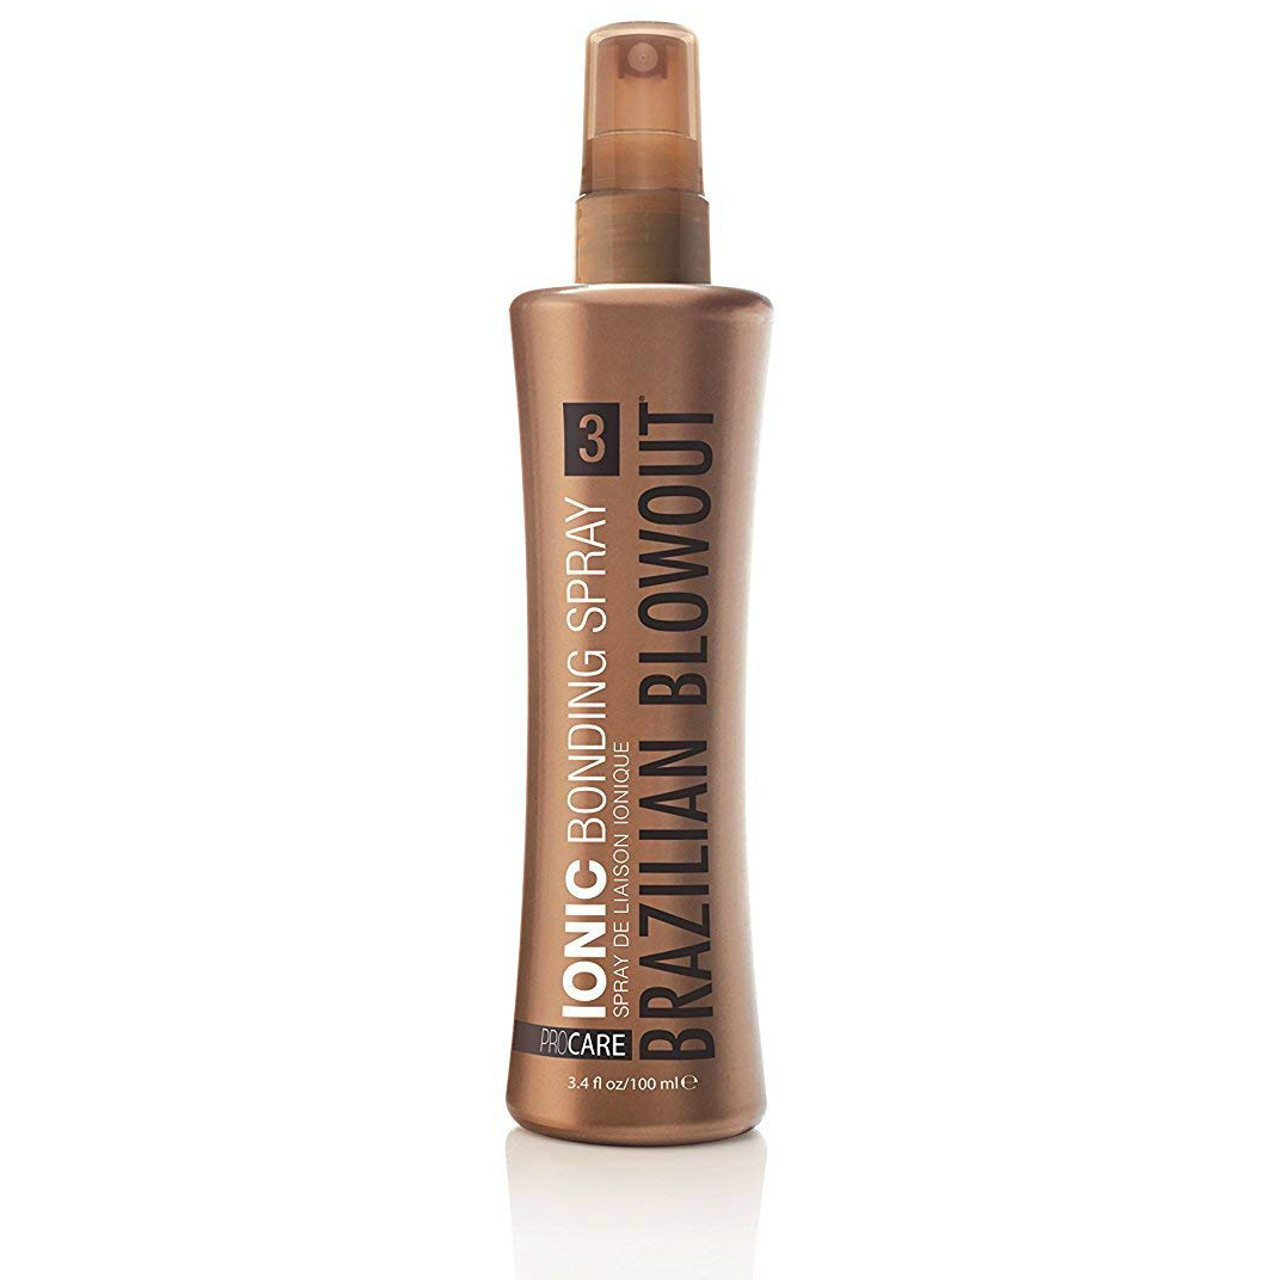 Brazilian Blowout Ionic Bonding Spray 3.4 oz